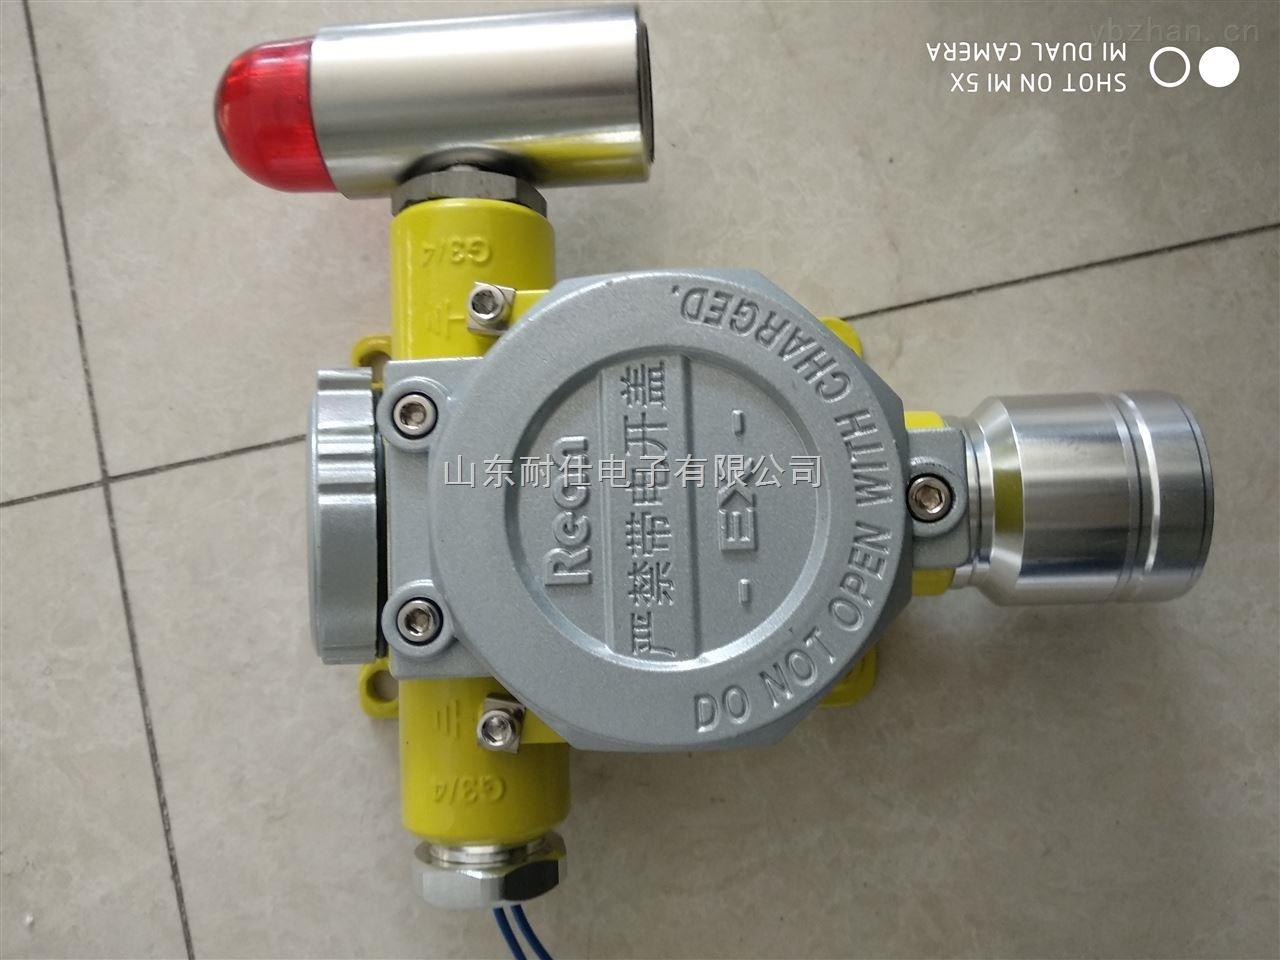 NS-000-濰坊市化工廠氣體報警器計量院第三方檢測